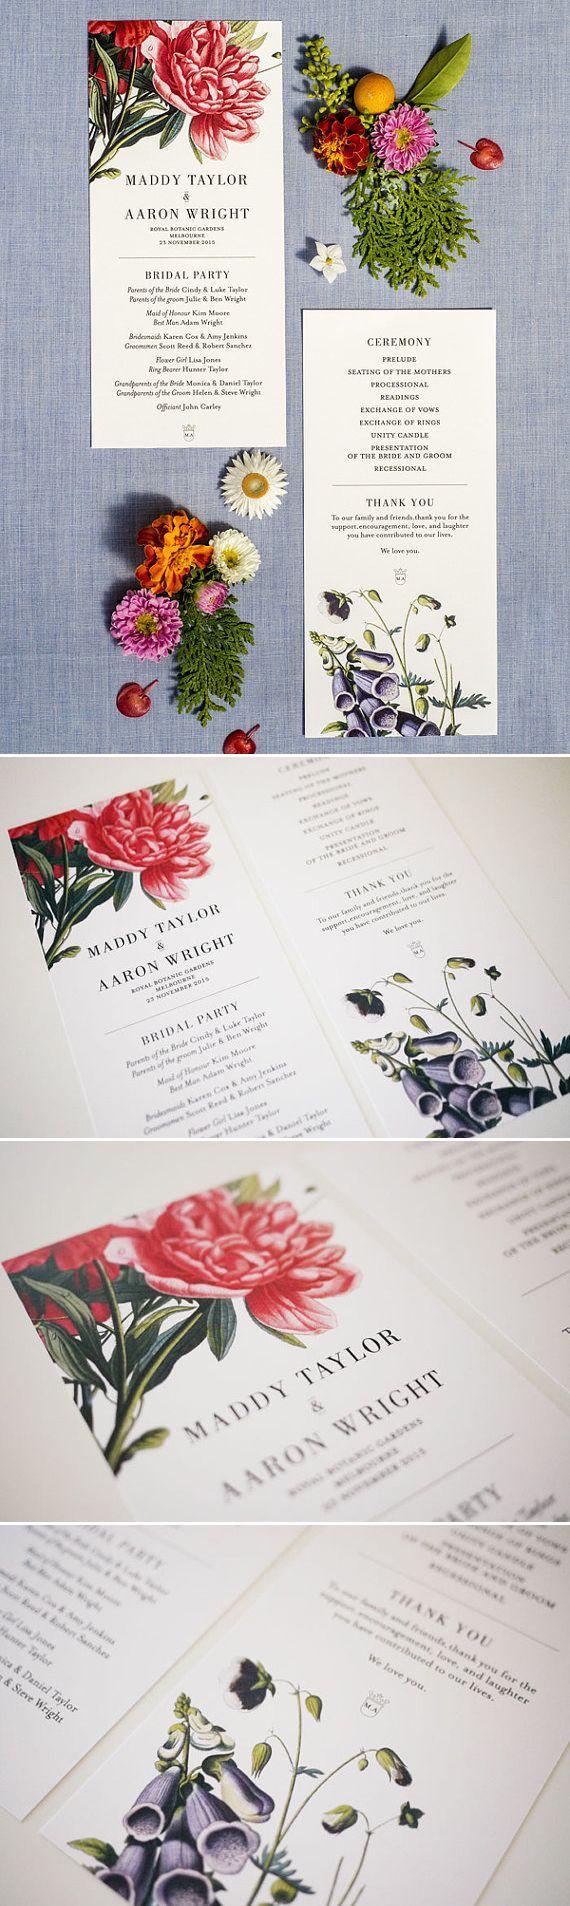 Botanical Floral Order of Service Wedding Program Printable | 3EggsDesign #design #graphicdesign #wedding